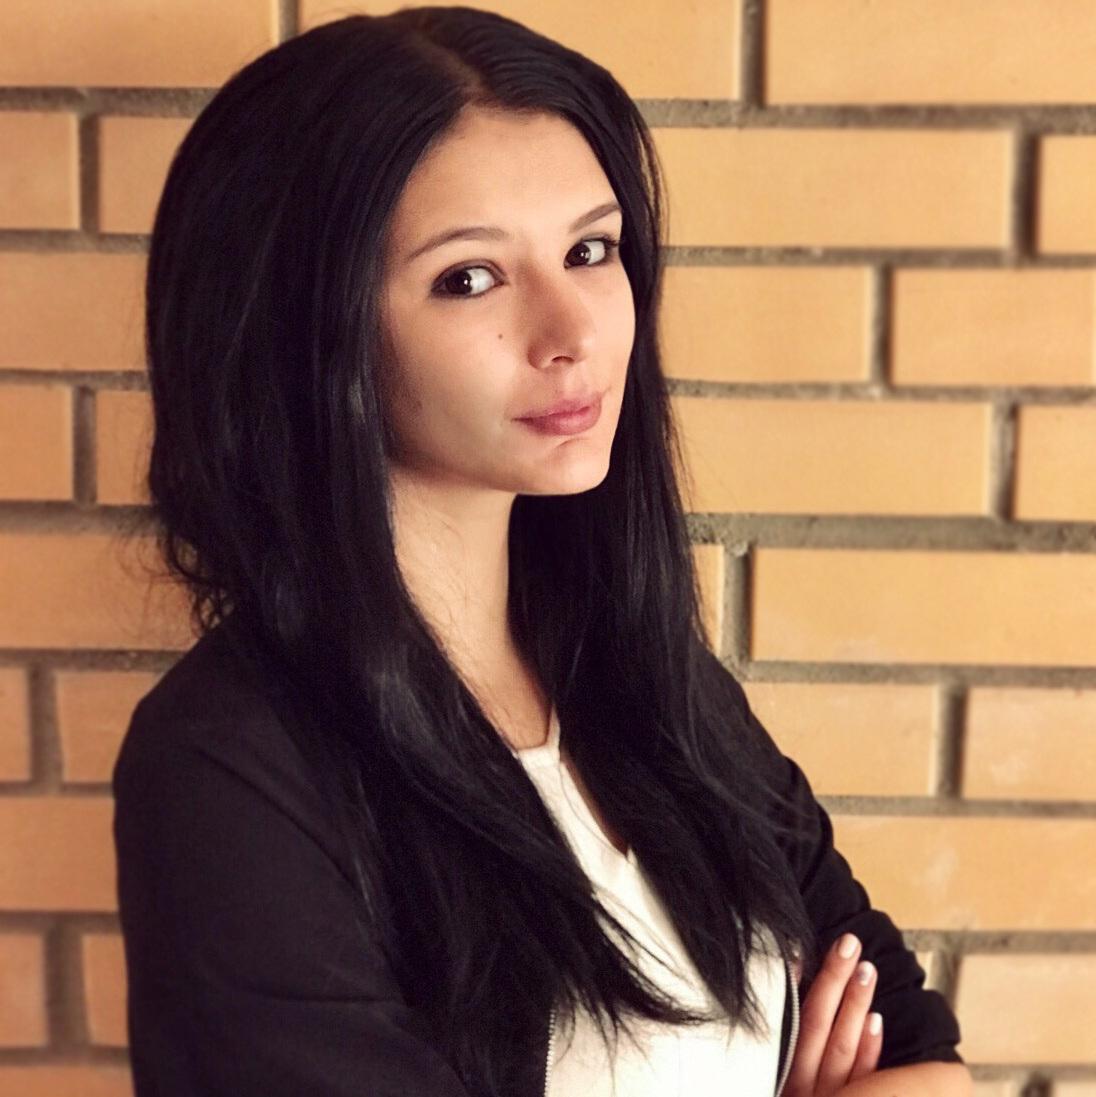 Daria - designer at Mediaforce